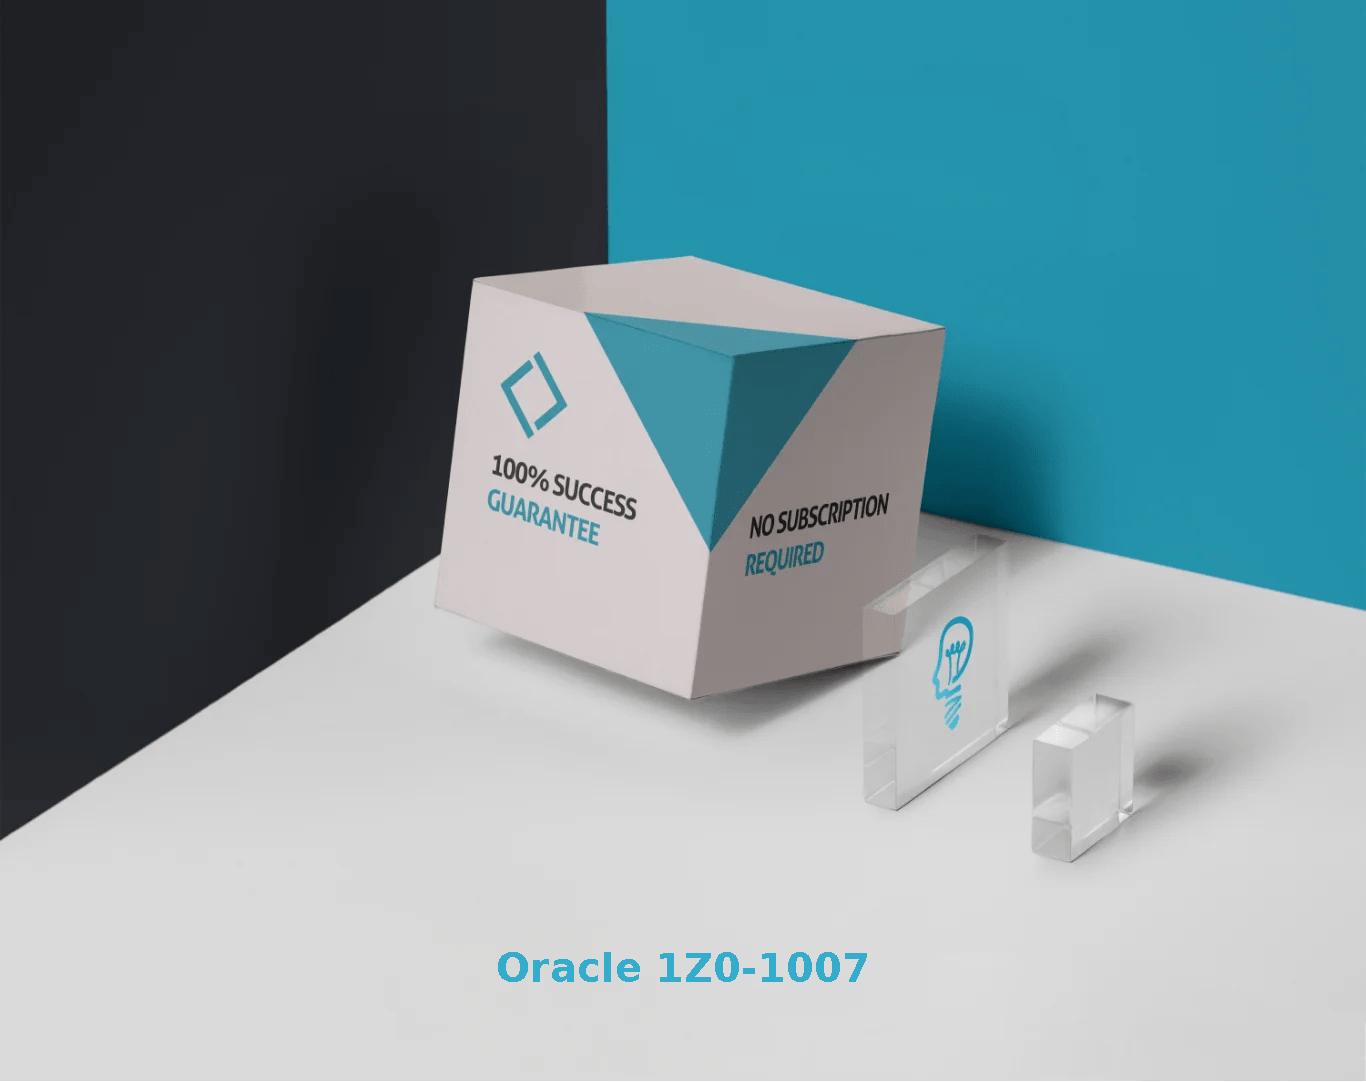 Oracle 1Z0-1007 Exams